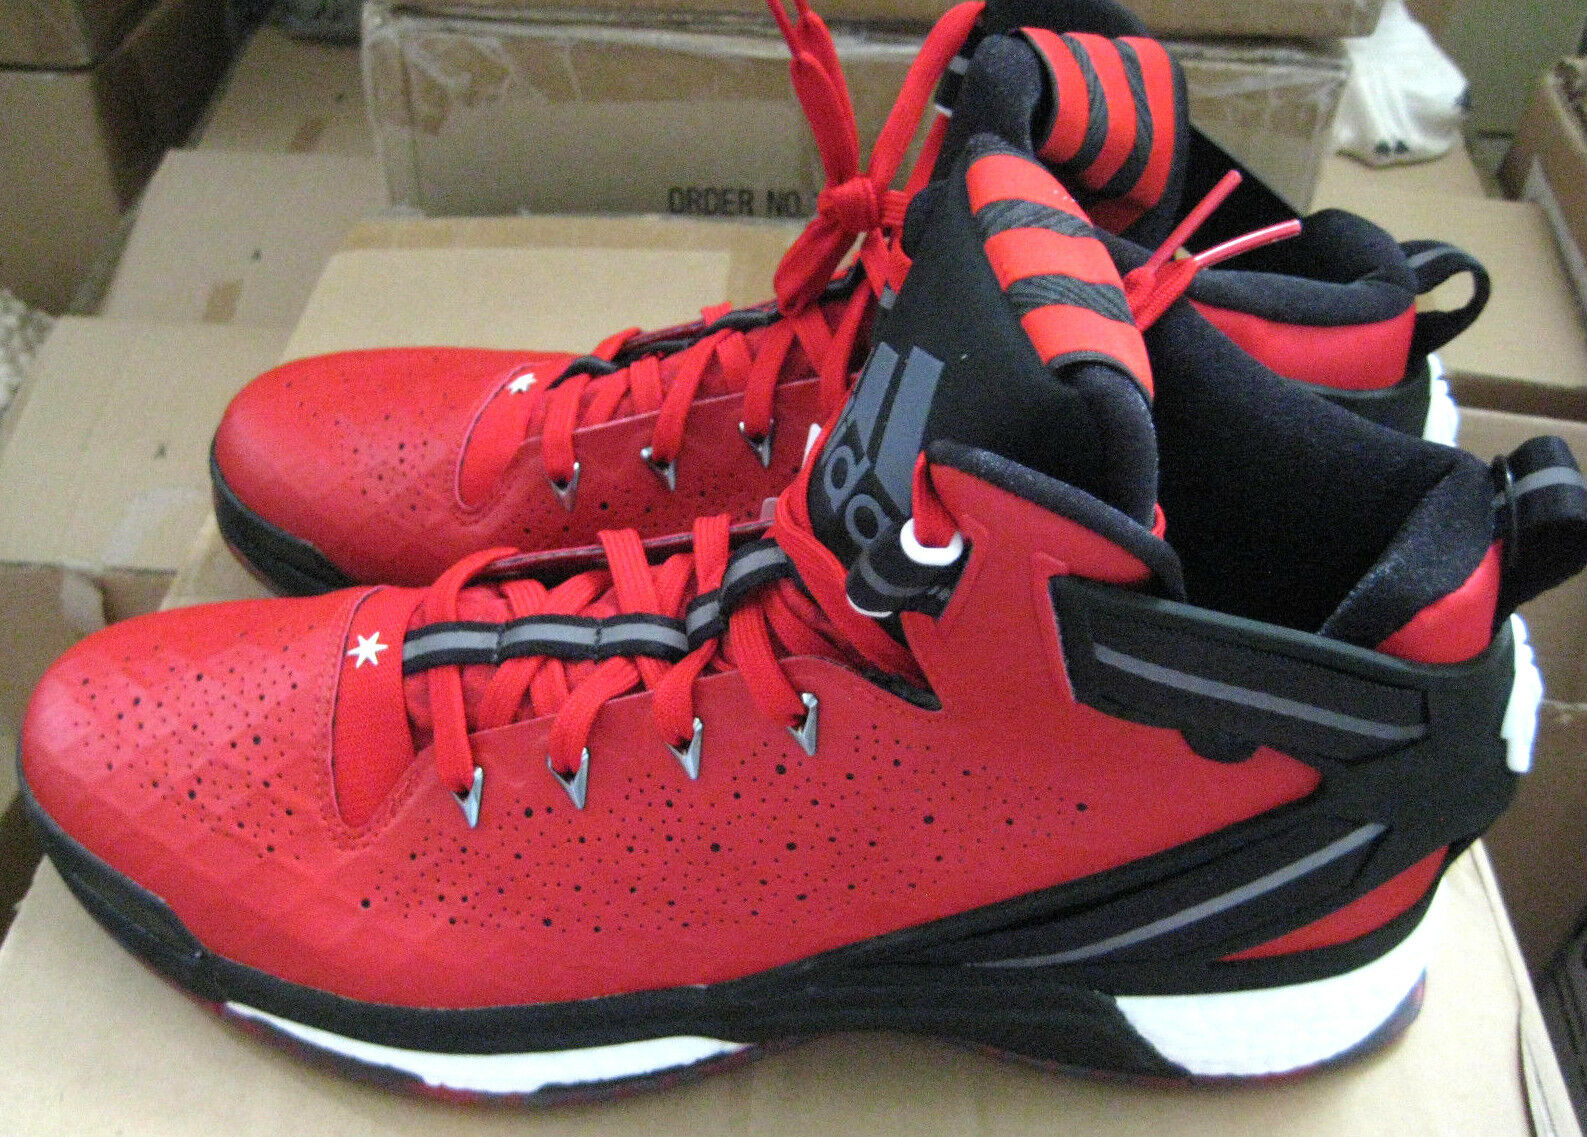 Adidas D Rose 6 Boost Rouge s95533 baketball Chaussures De Loisirs Rouge Boost Noir 012871